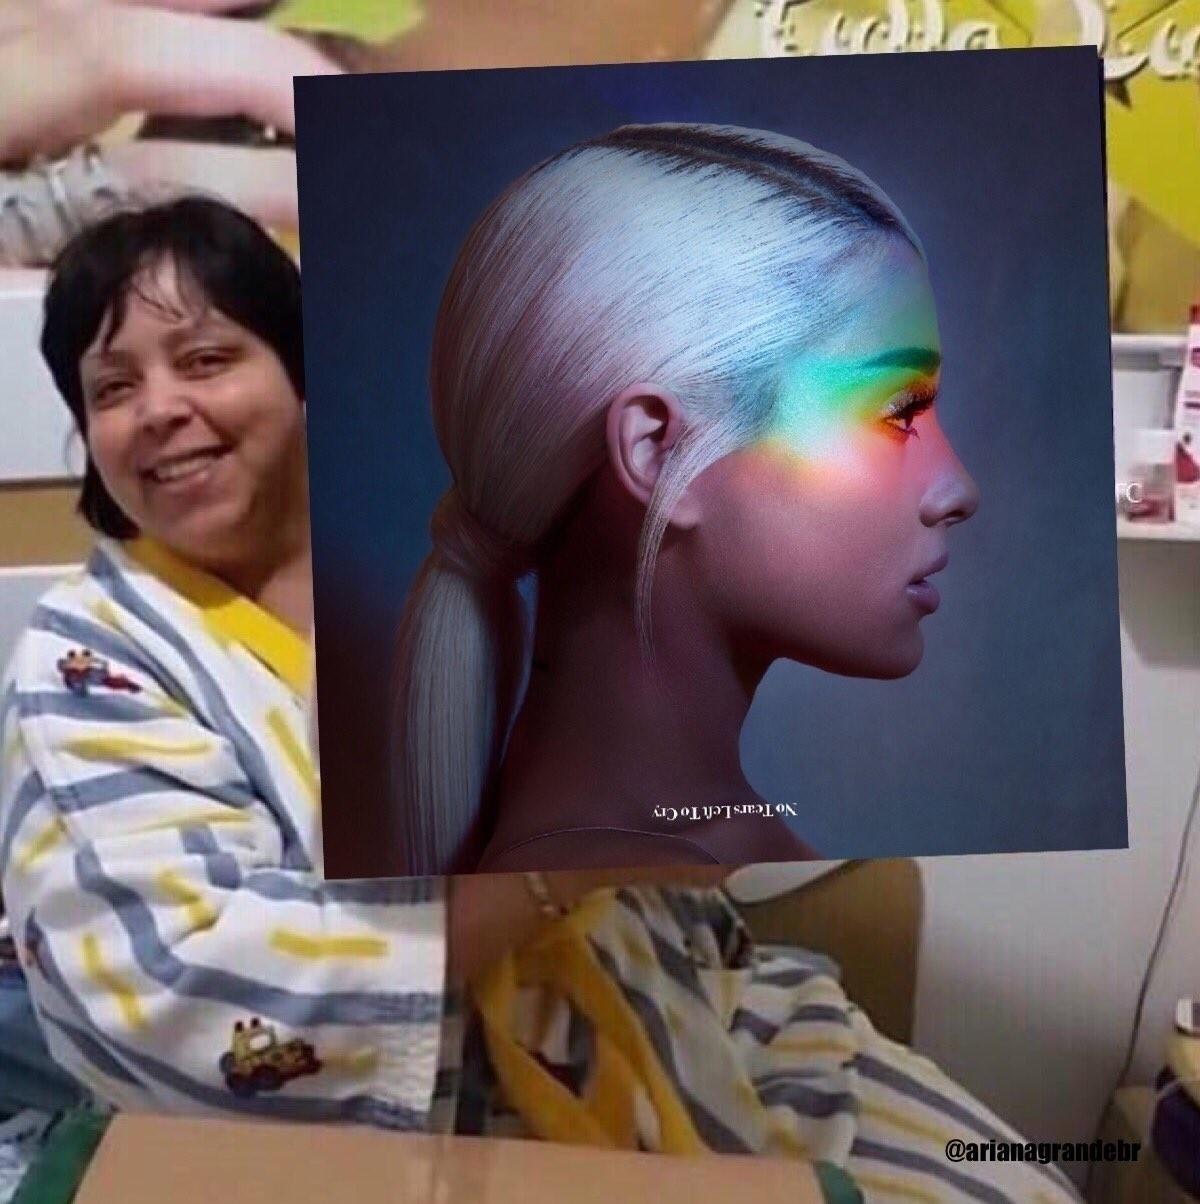 buy tears left cry iTunes - ArianaGrande - marvete | ello